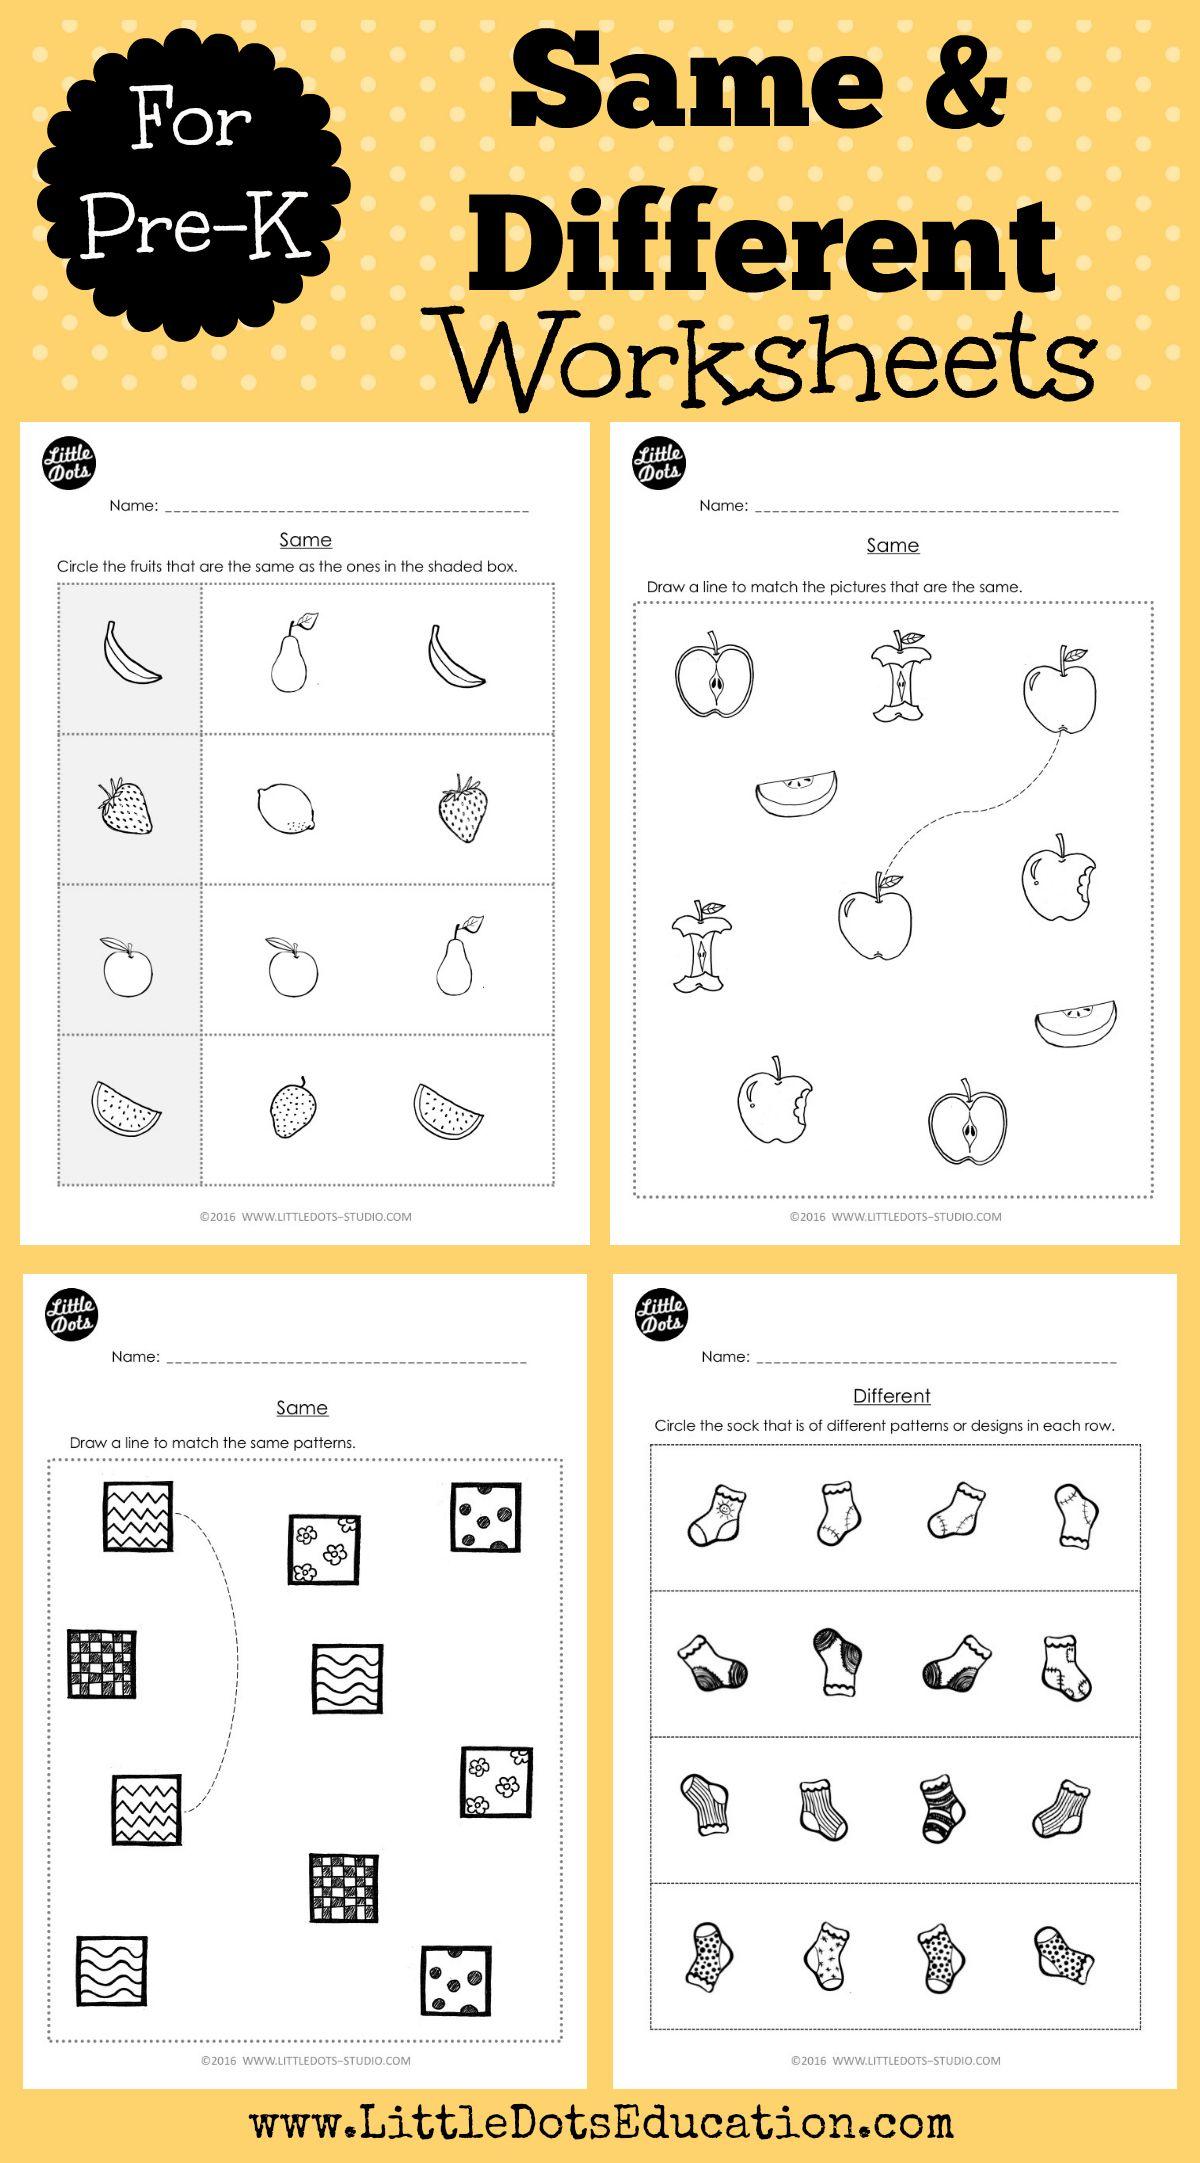 Pre-K Same and Different Worksheets and Activities   Kindergarten worksheets [ 2163 x 1200 Pixel ]